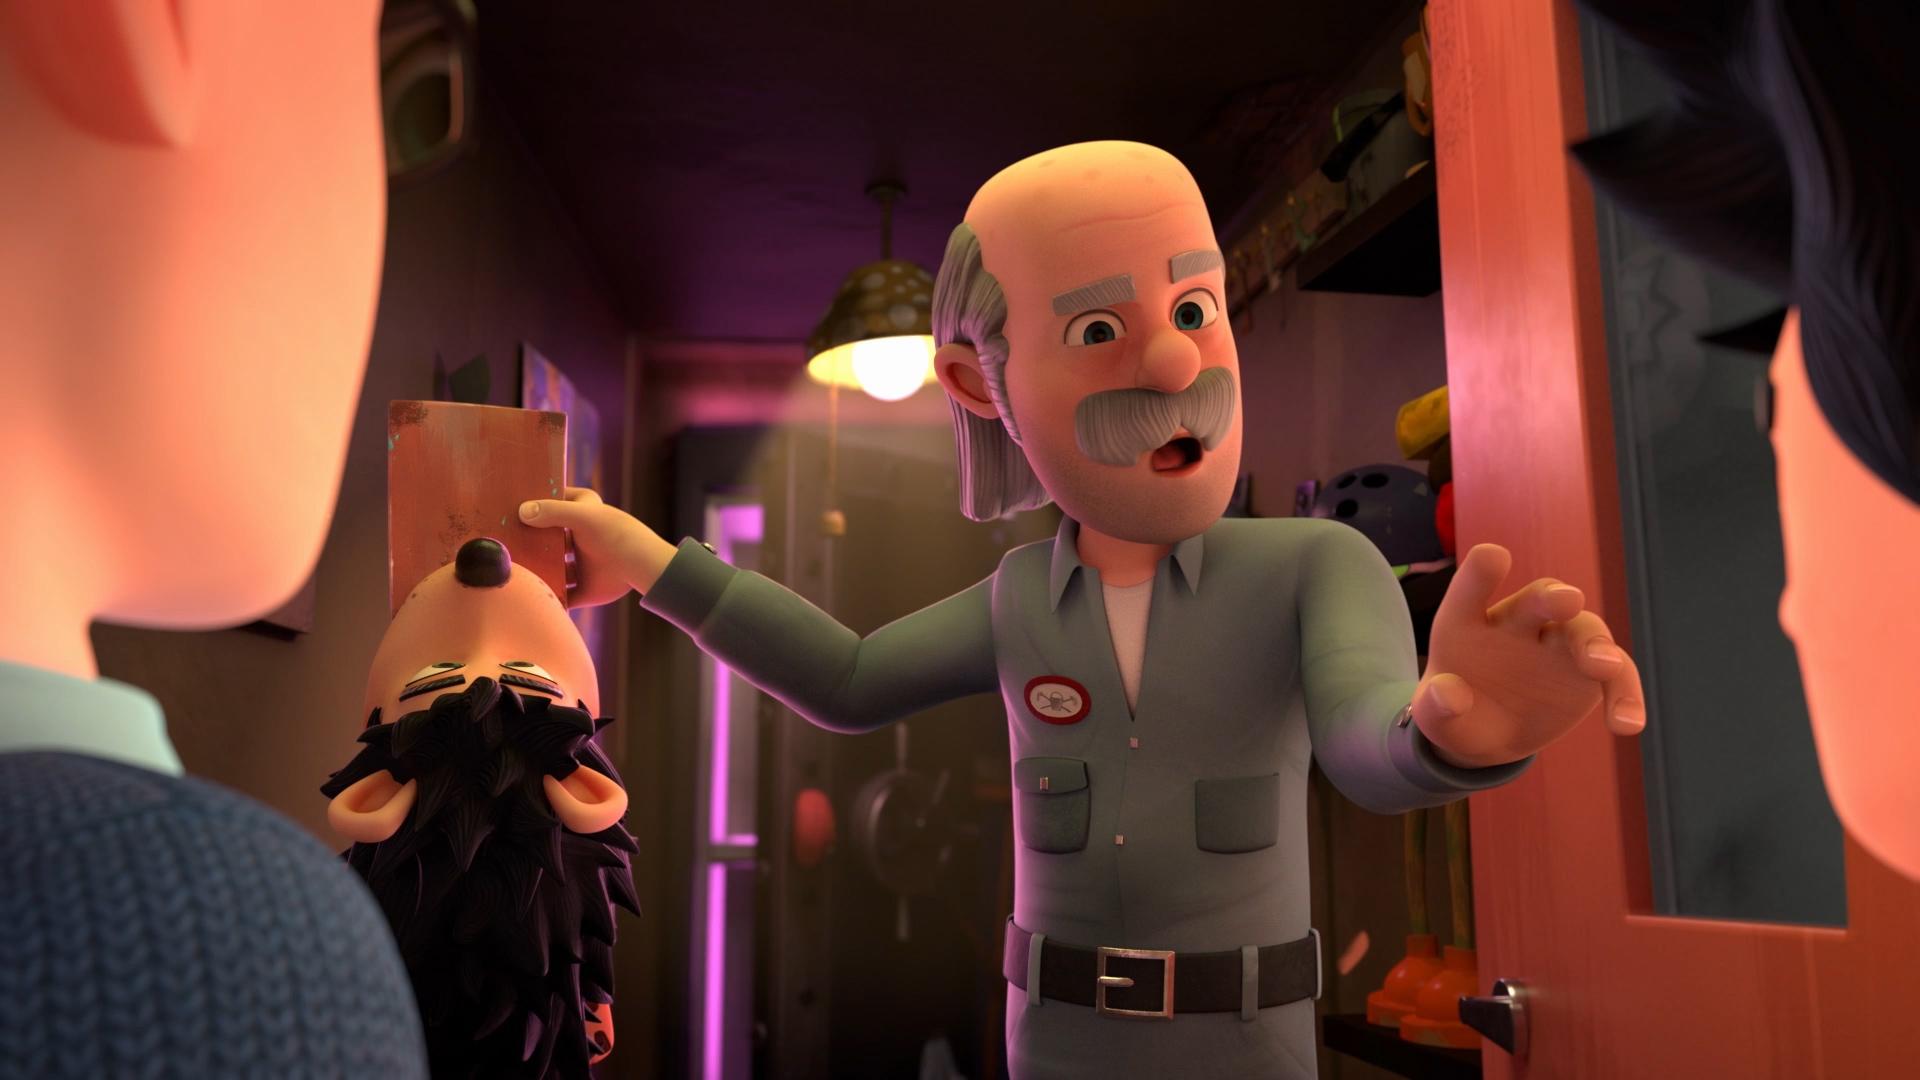 Ralph the caretaker